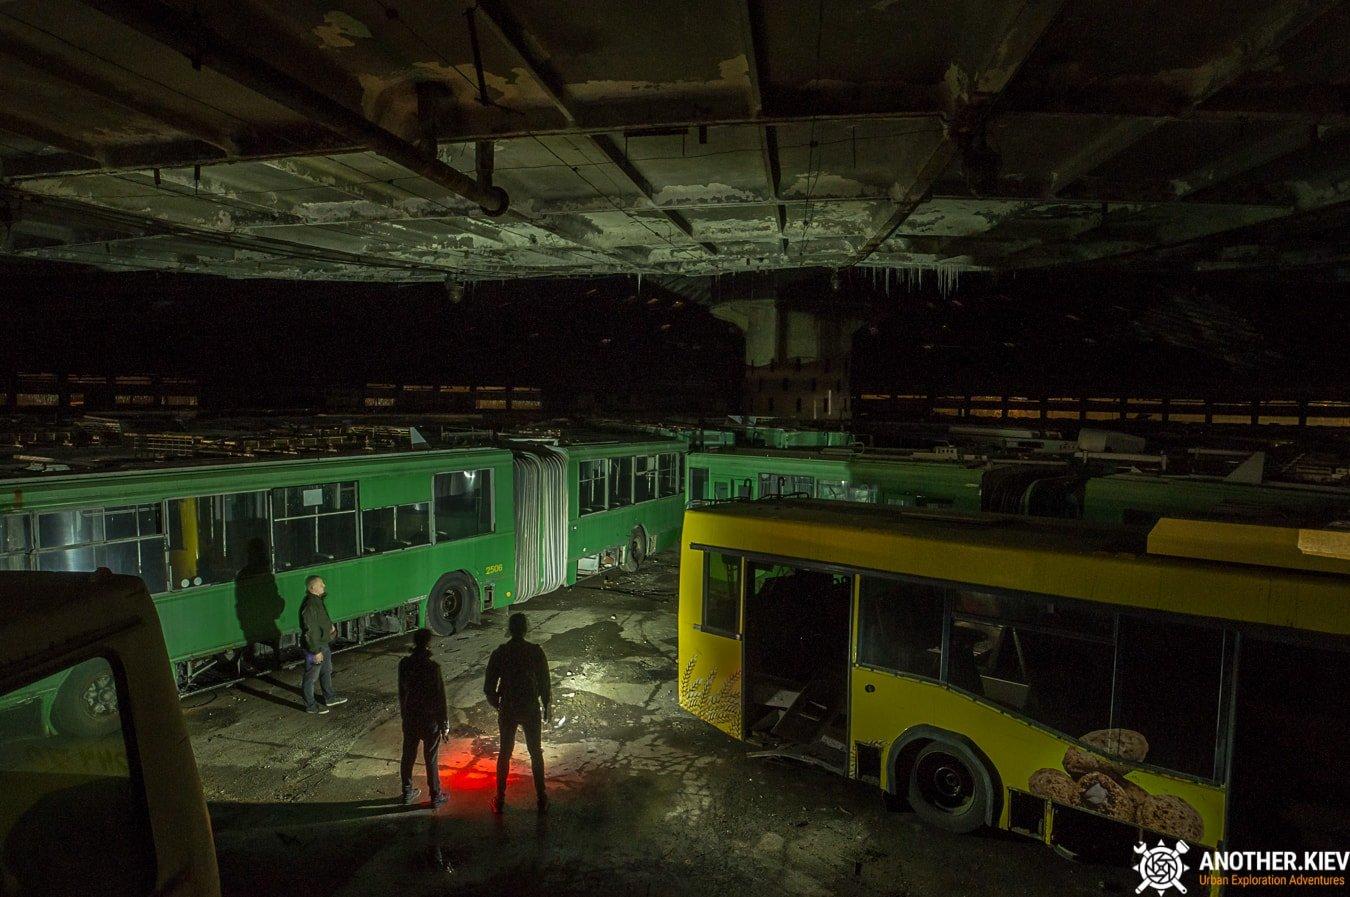 bus-graveyard-kiev-6750-min EXPLORING ABANDONED BUS GRAVEYARD IN KIEV